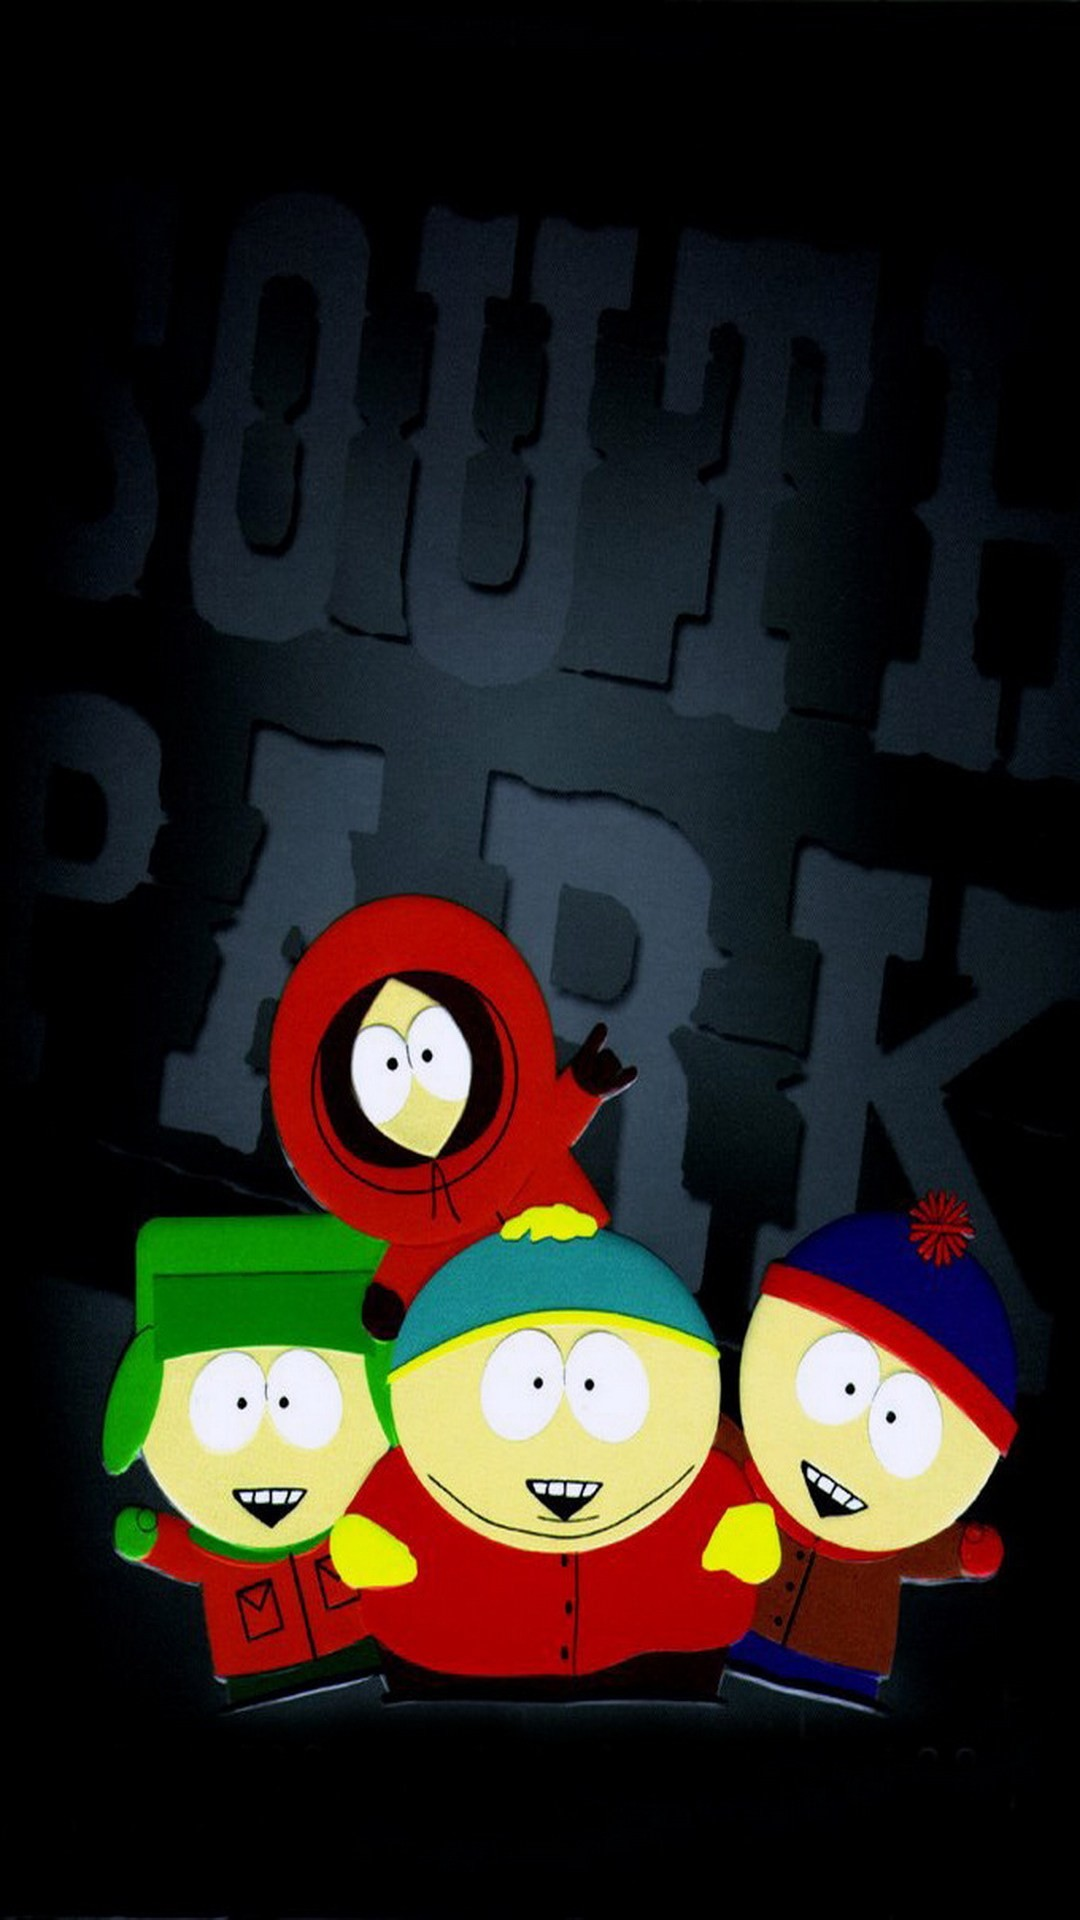 South Park Phone Wallpaper 71 Images